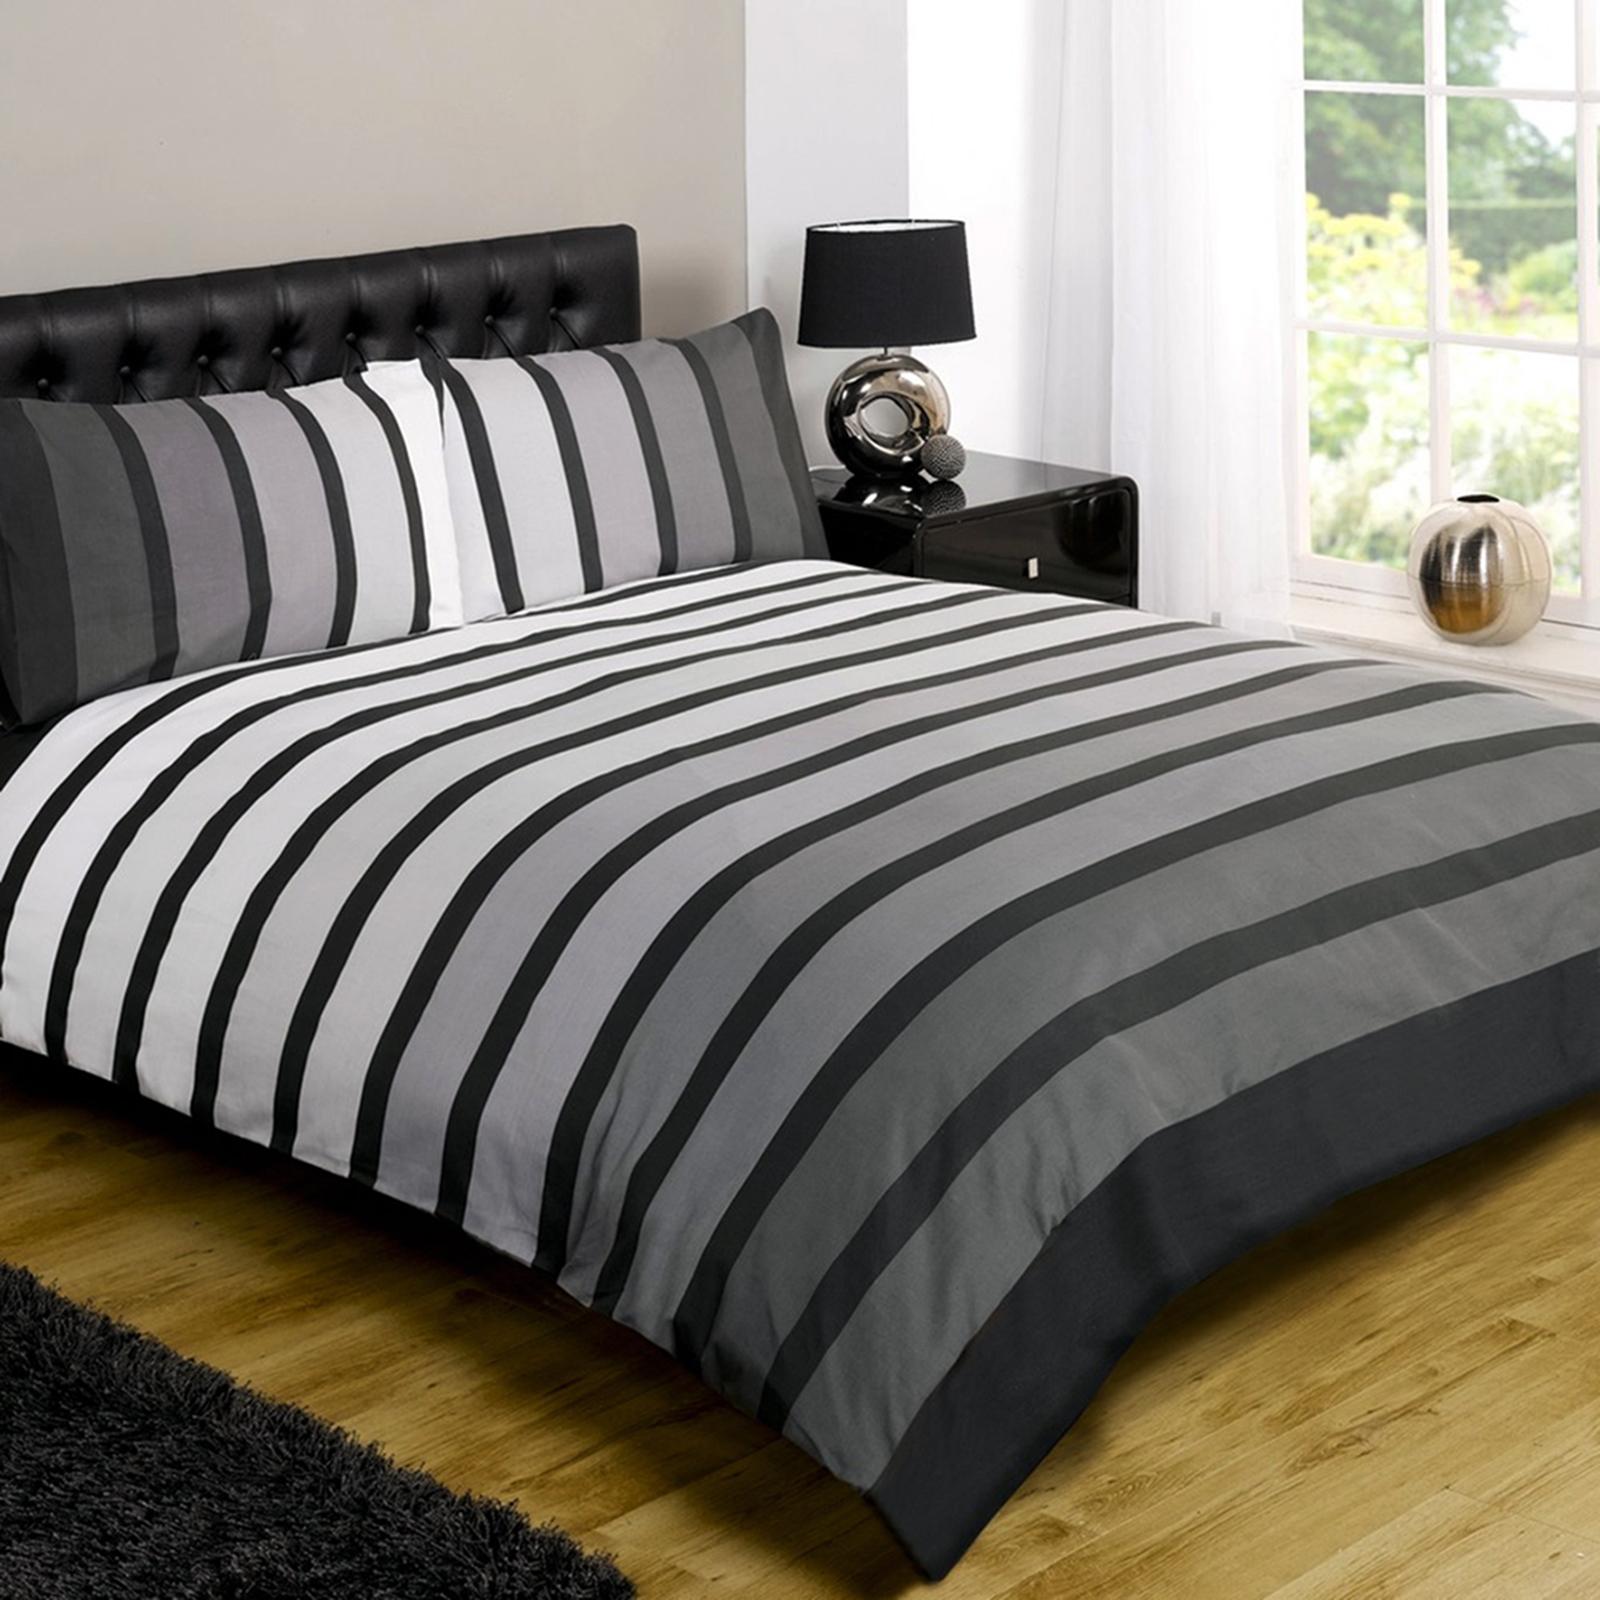 Modern quilt bedding - Striped Poly Cotton Duvet Cover Modern Quilt Cover